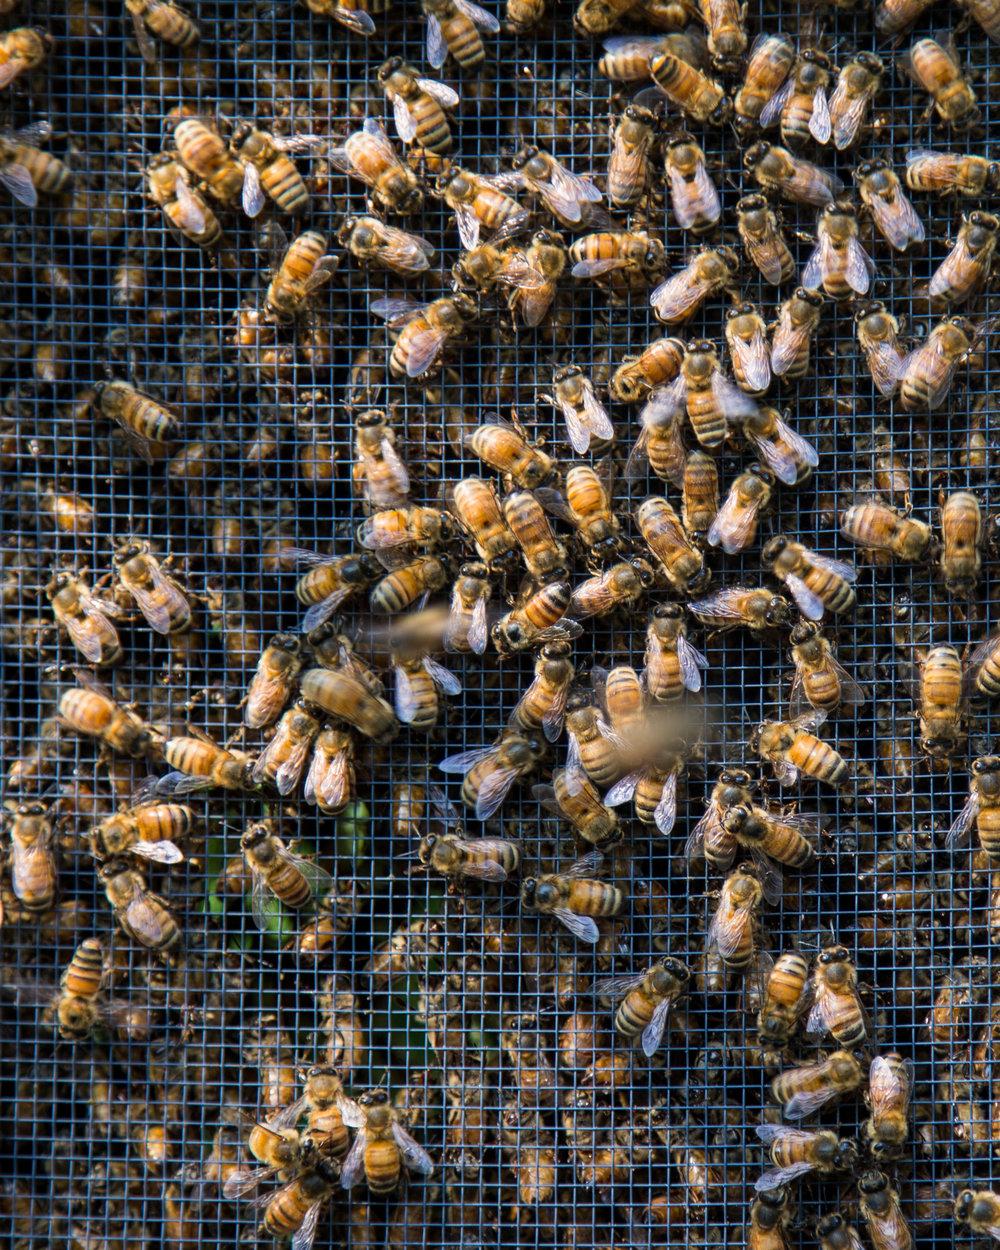 Beekeeper-18.jpg